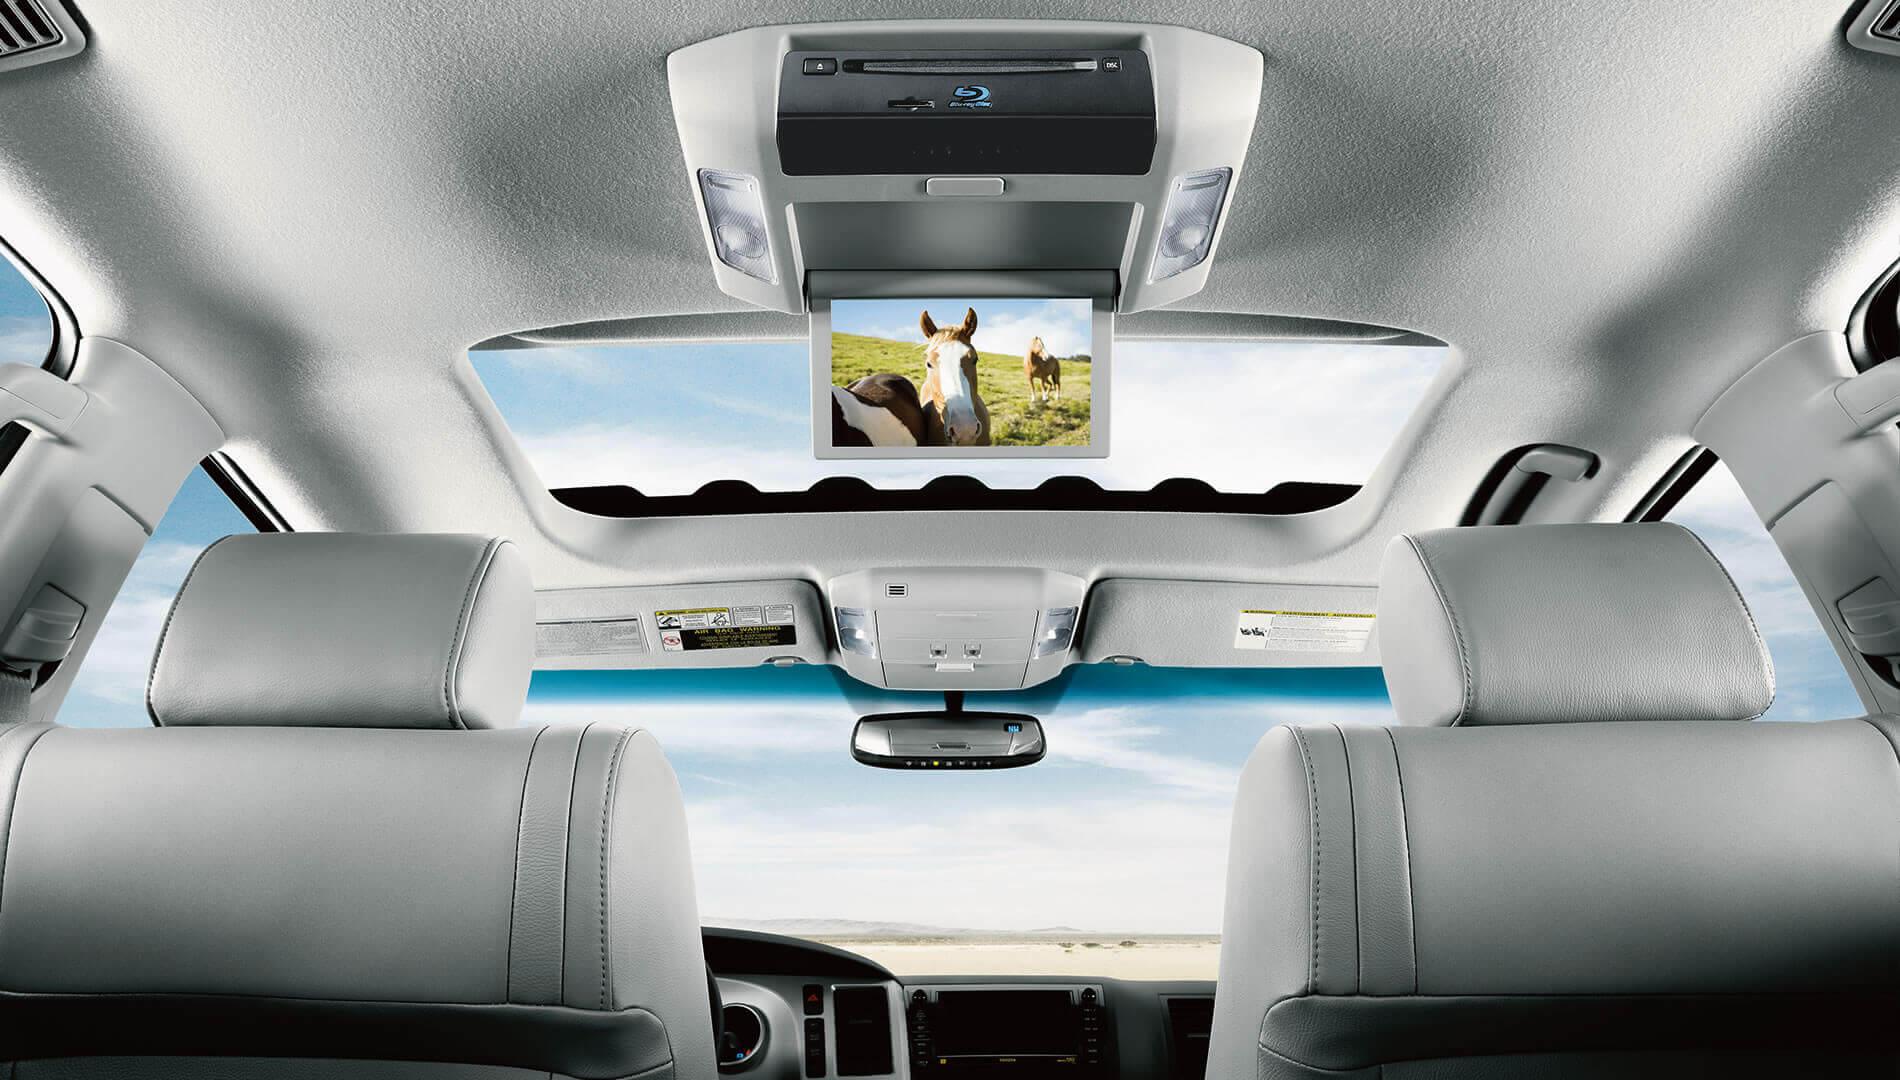 2017 Toyota Sequoia technology interior